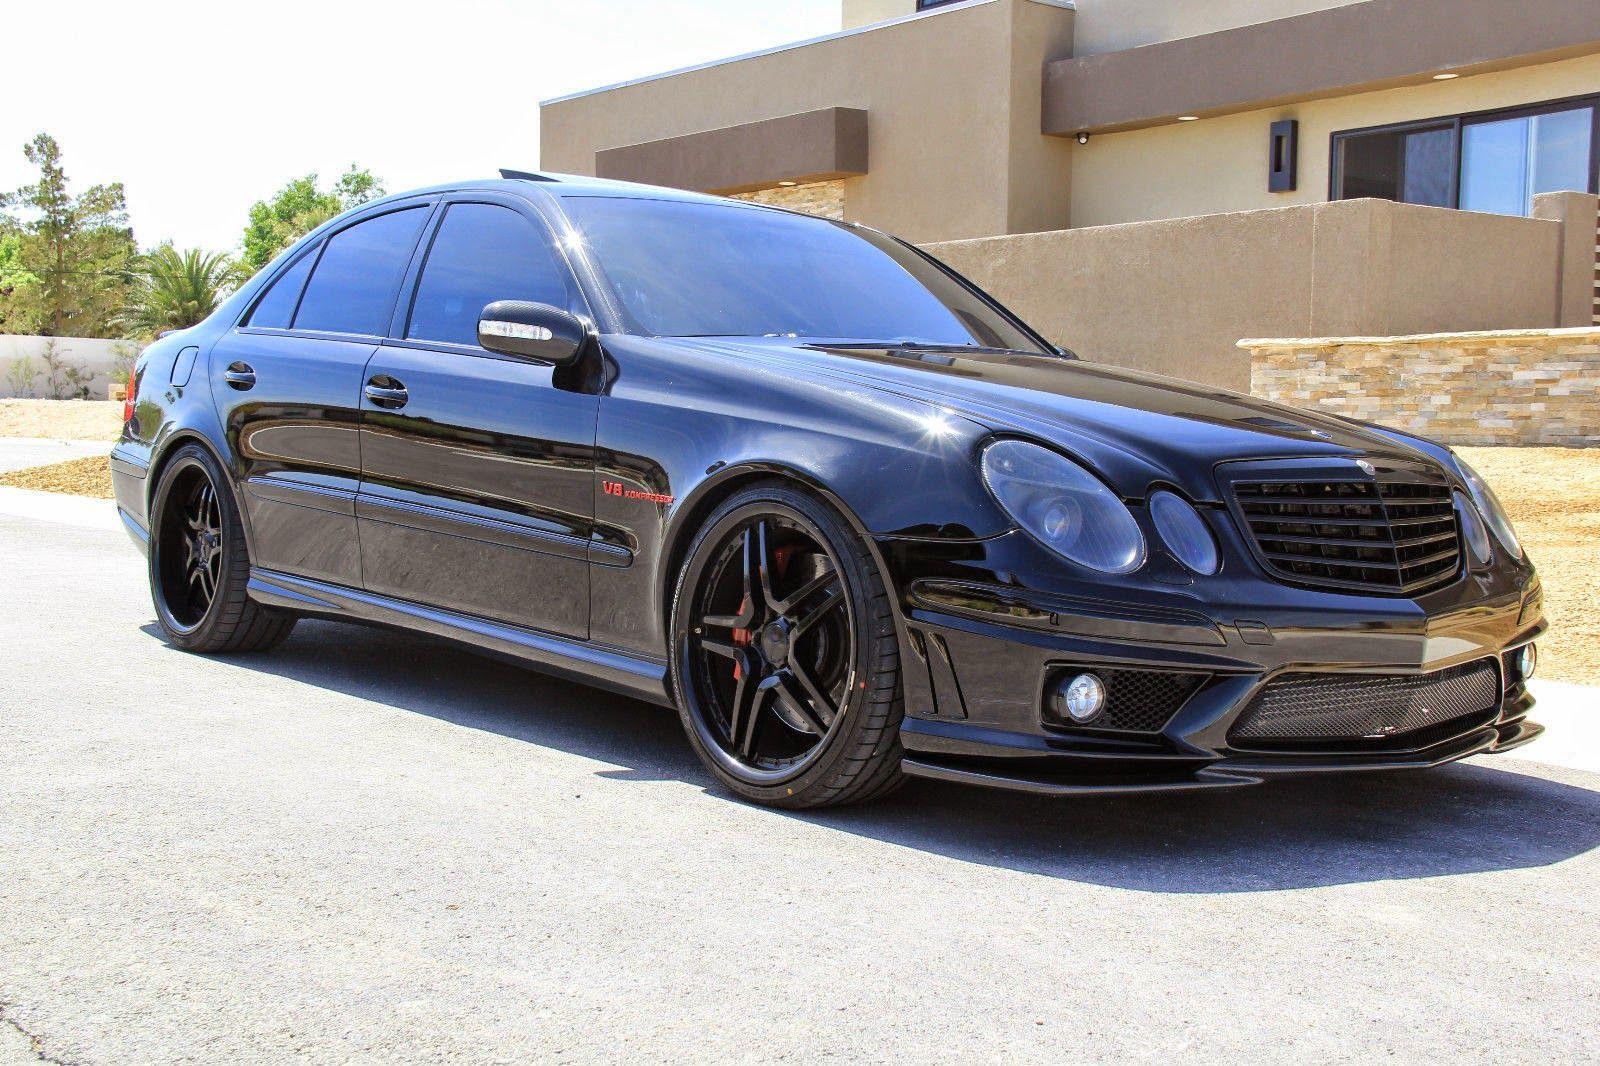 Mercedes benz w211 e55 amg renntech shadowline large for Mercedes benz e55 amg